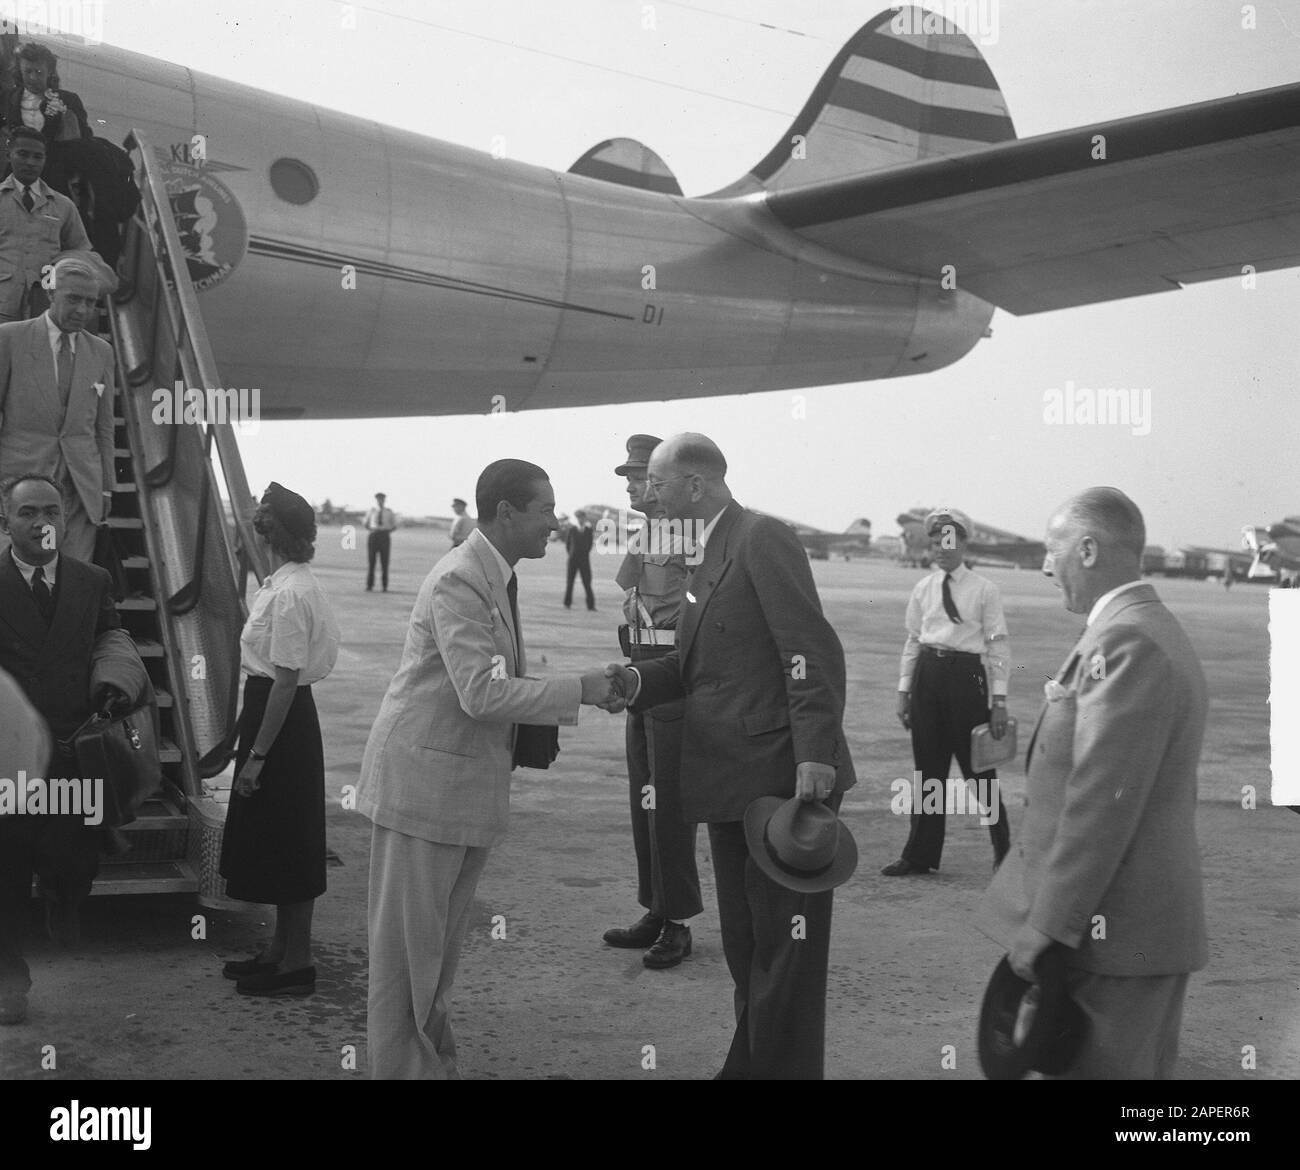 Arrivée Sultan Hamid À L'Aéroport De Schiphol. Salutation par le ministre Maarseeveen Date: 6 août 1949 mots clés: Arrivée, salutations Nom personnel: Hamid II, Maarseveen, J.H. van Banque D'Images